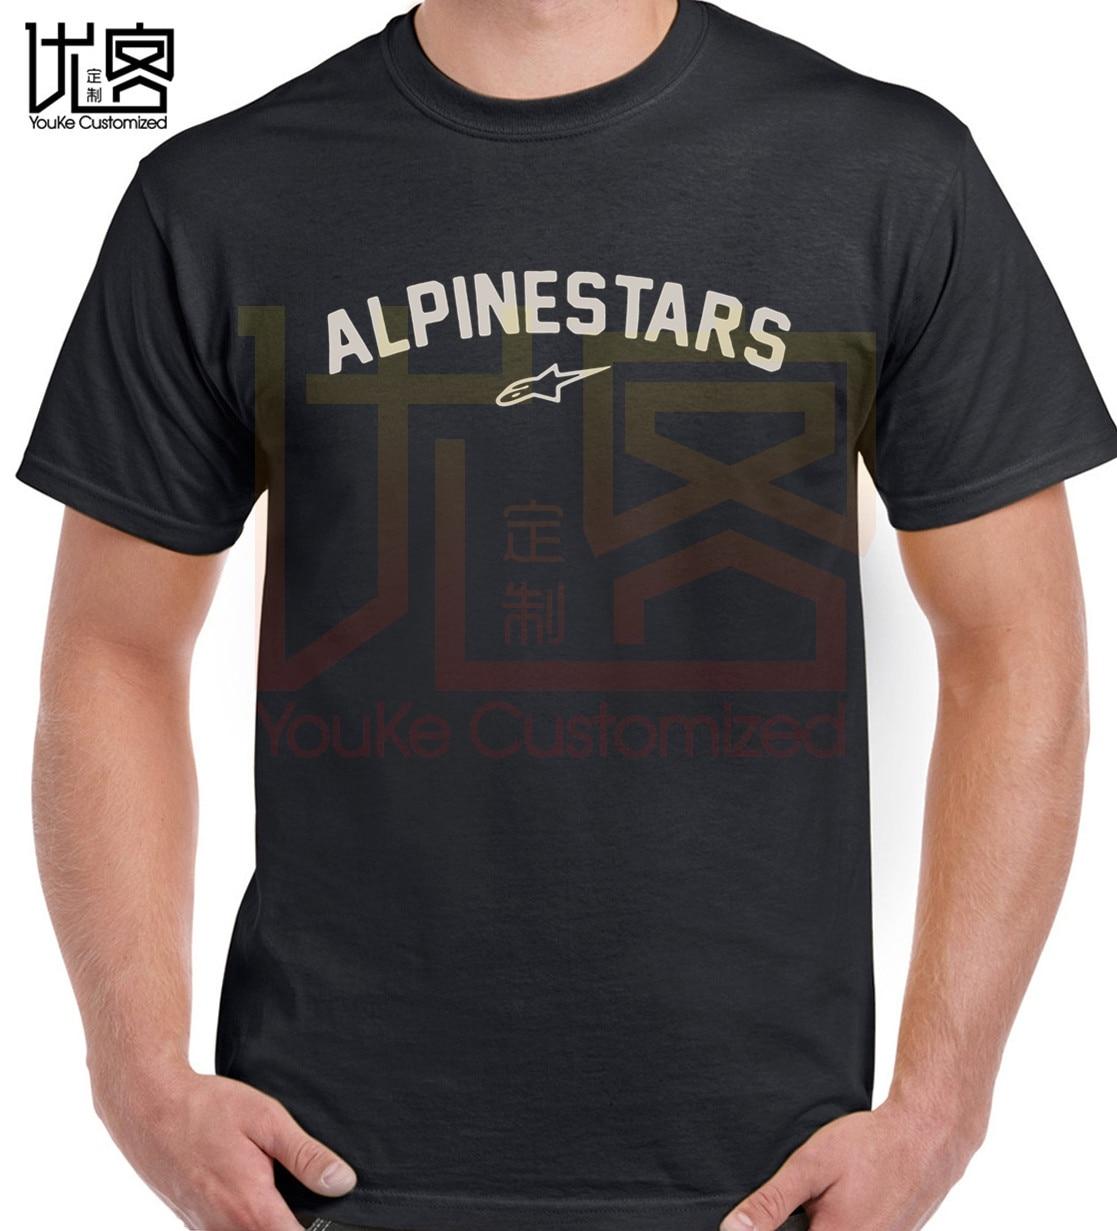 ALPINESTARS Ward T Shirt Men's Women's 100% Cotton Short Sleeves Tops Tee Printed Crewneck Casual T-shirt